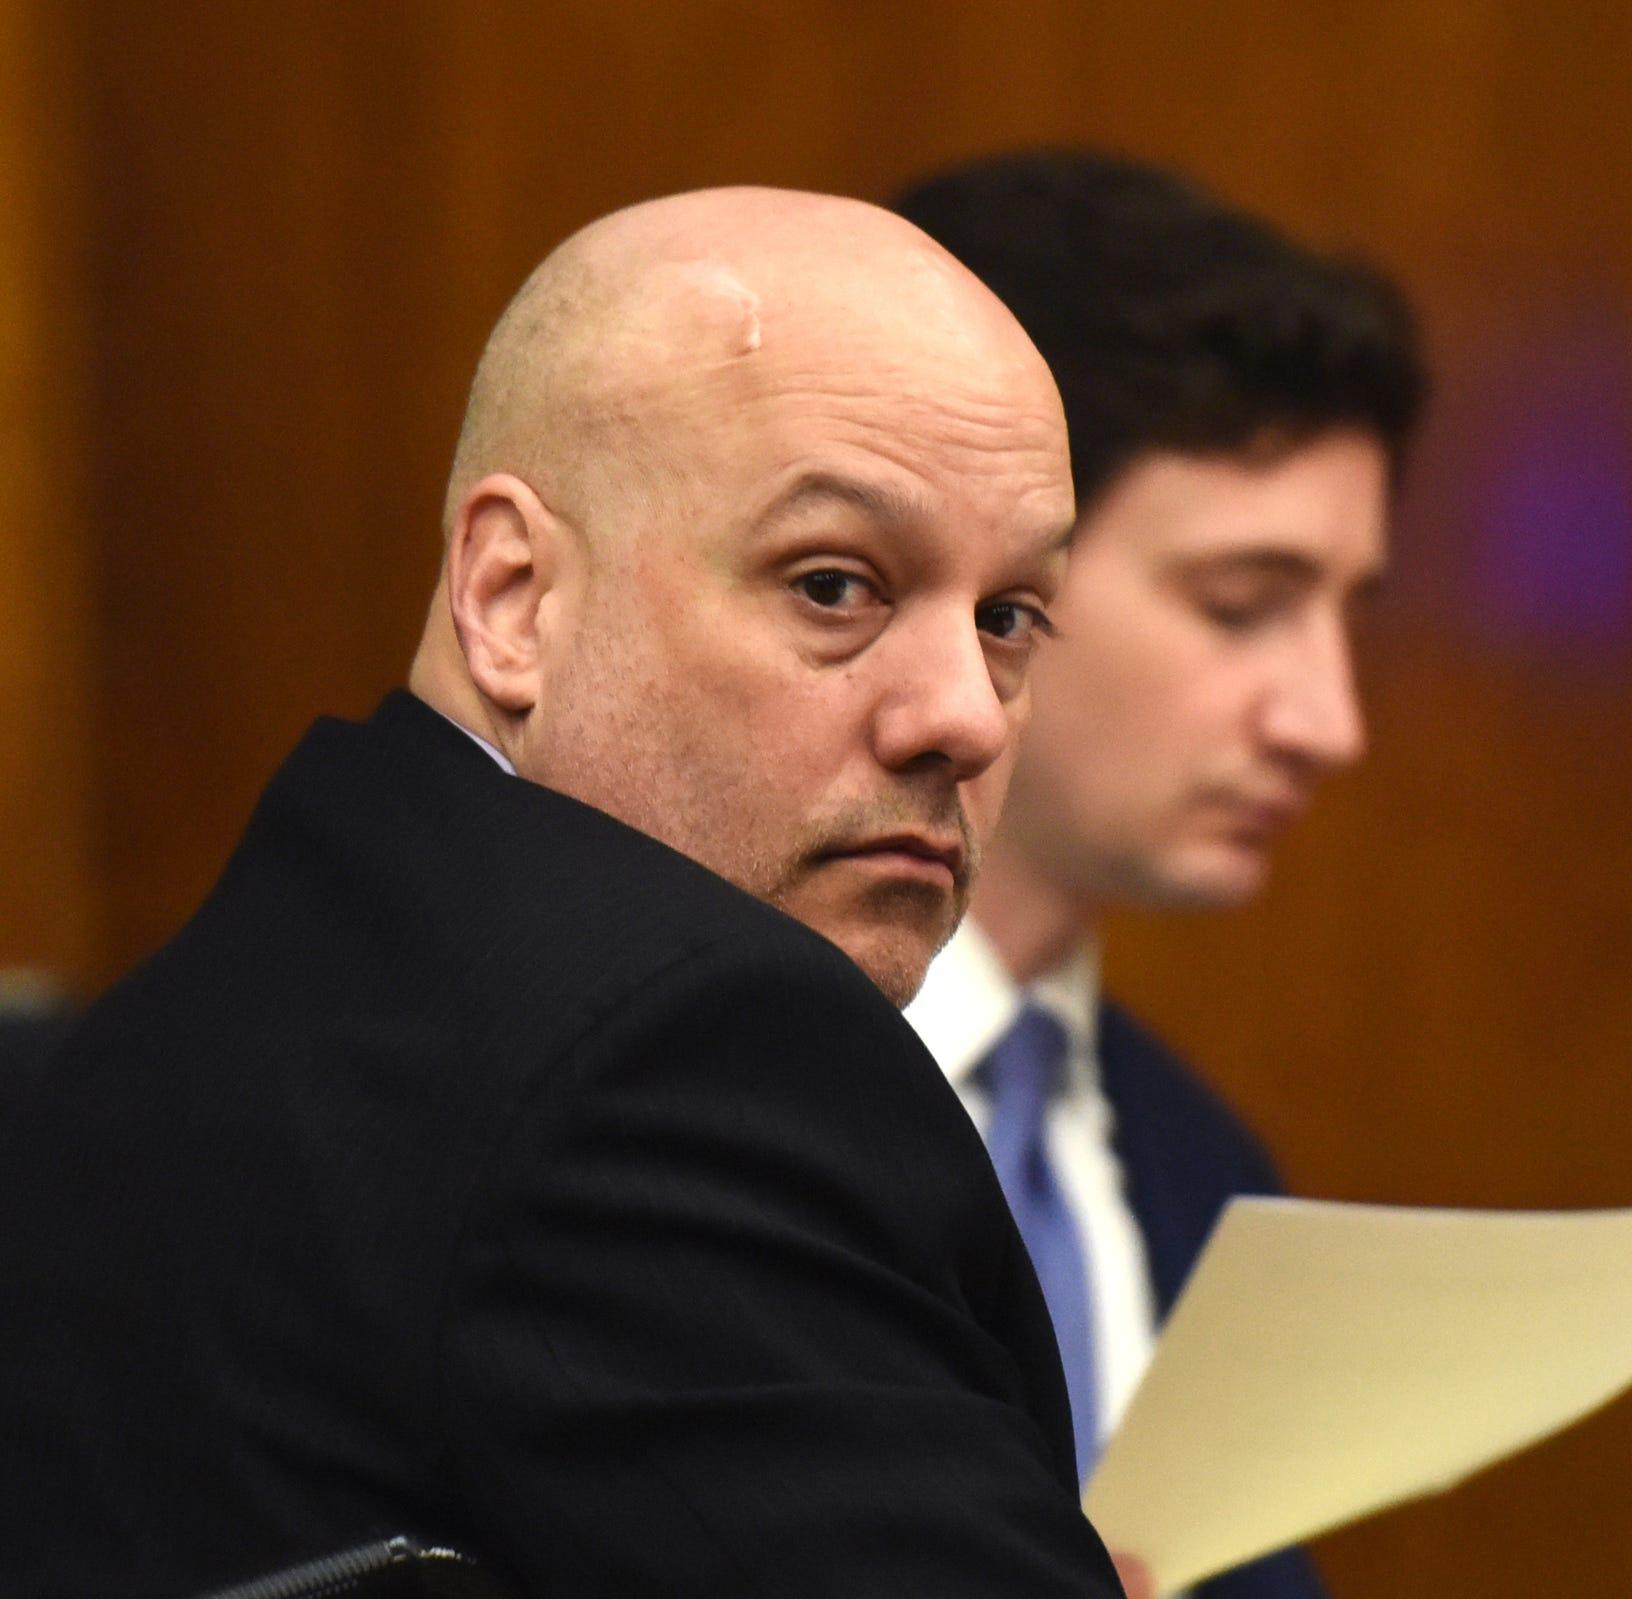 Arthur Lomando guilty of murdering ex-girlfriend in machete attack at her home